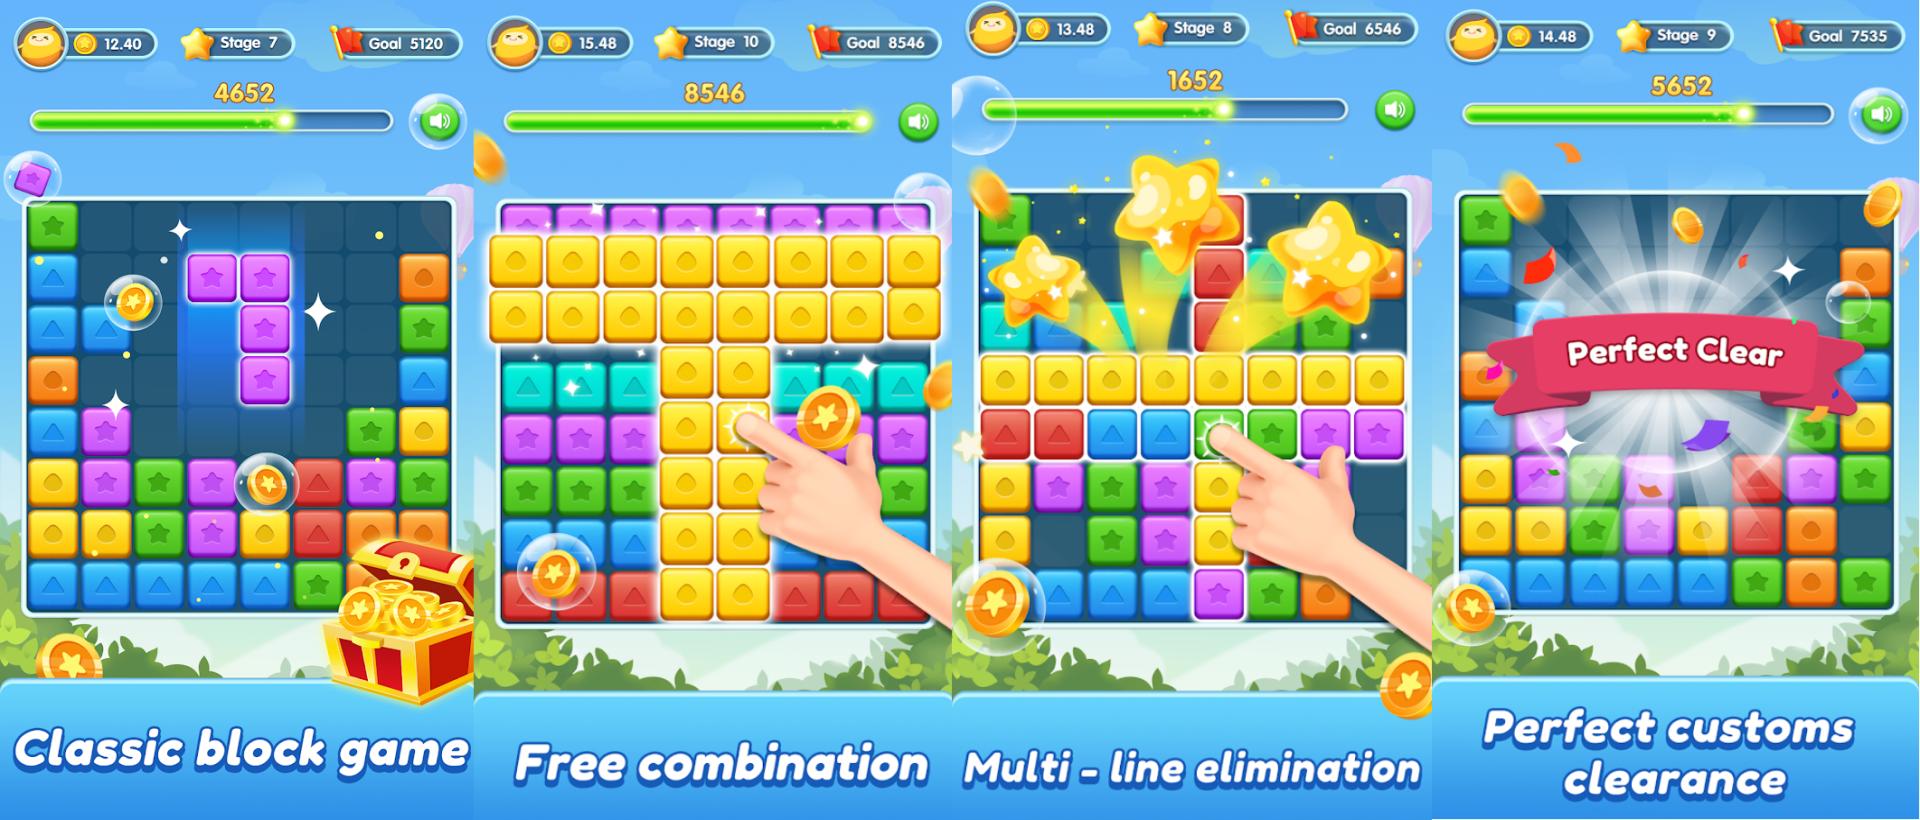 Block Crush-Classic Color Block Game